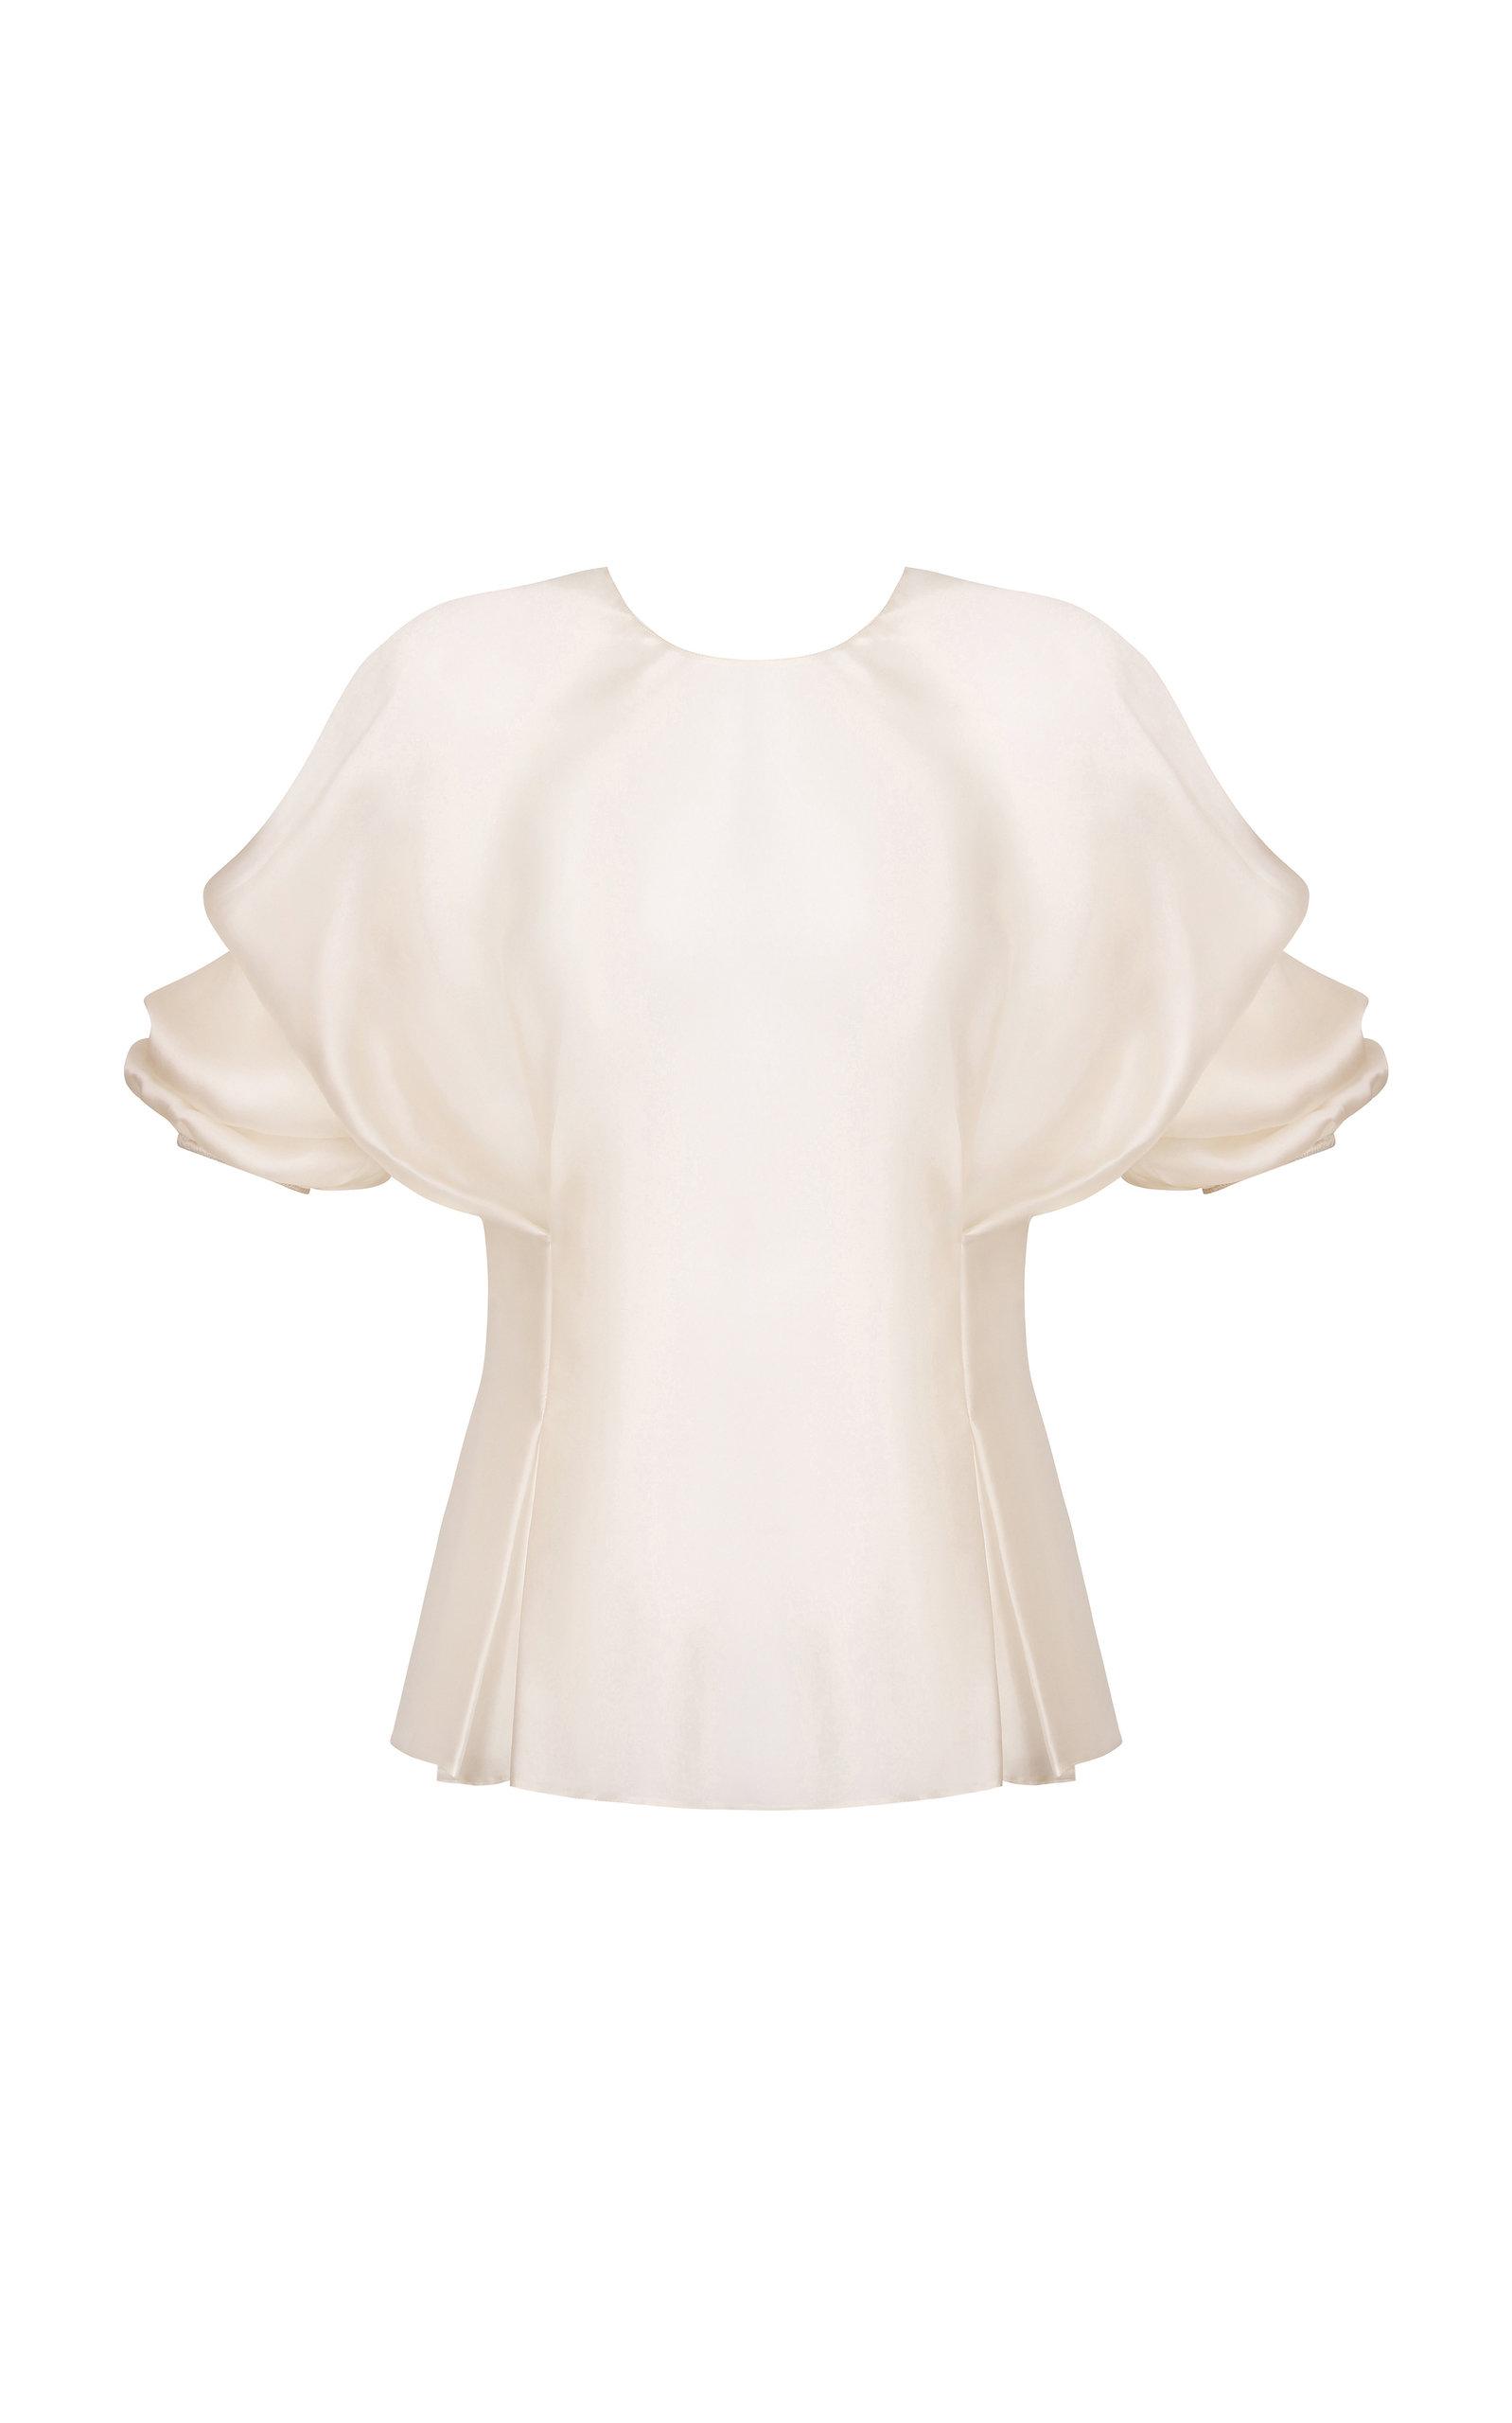 ABADIA Pleated Volume Silk Top in White